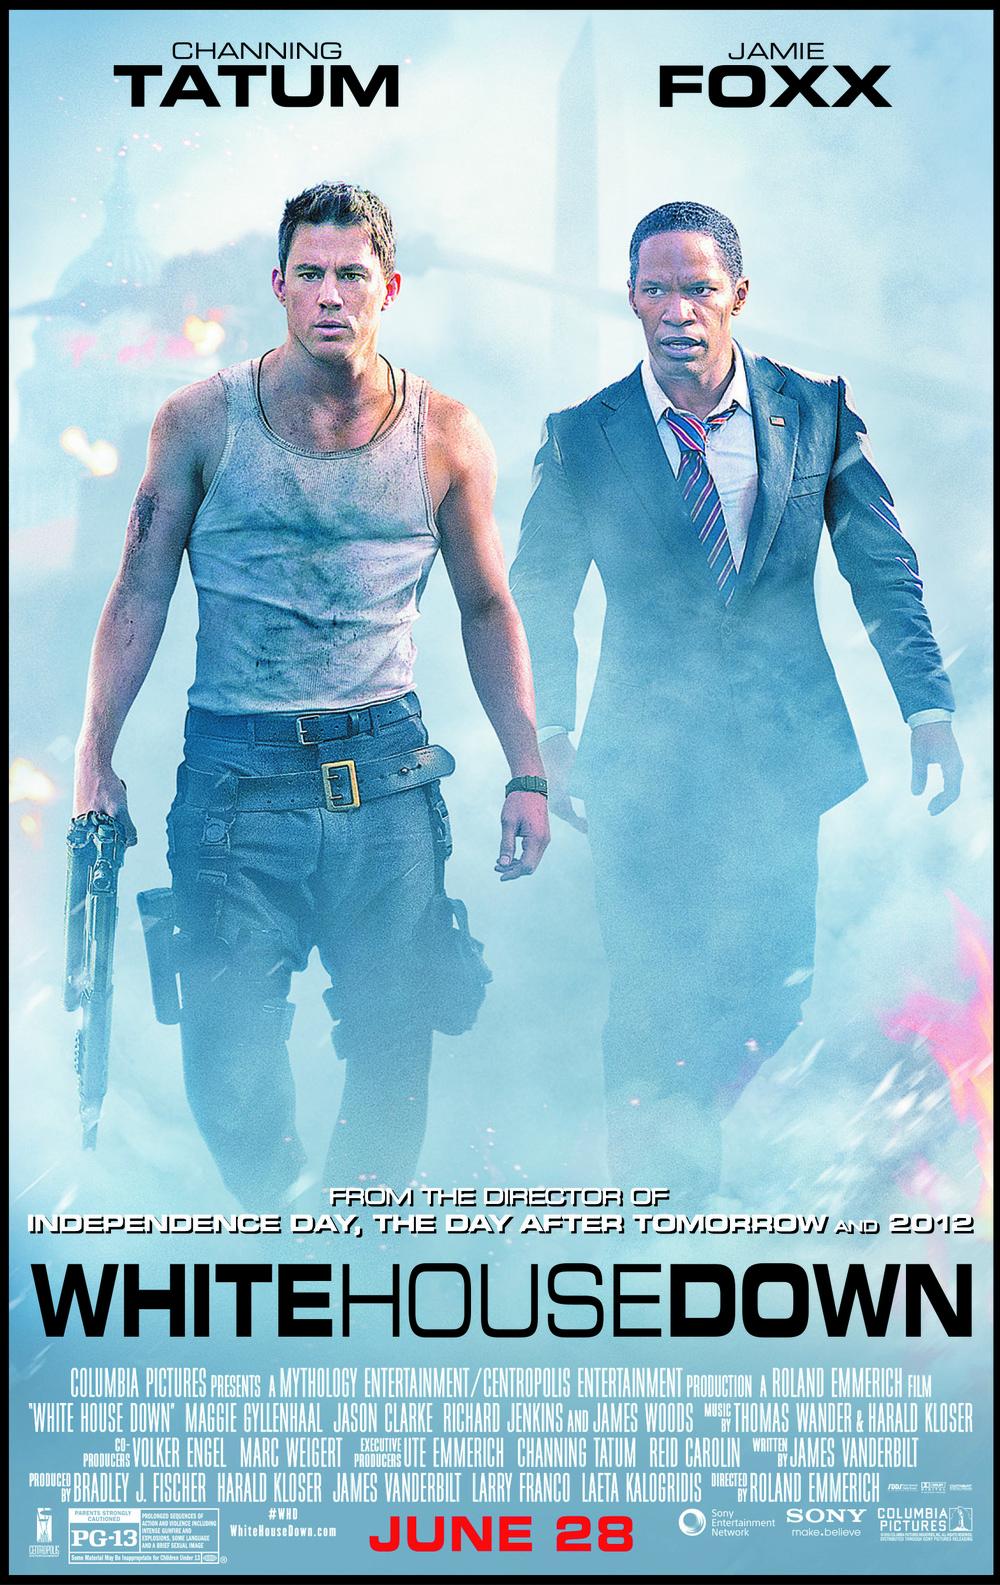 white-house-down-final-poster.jpg